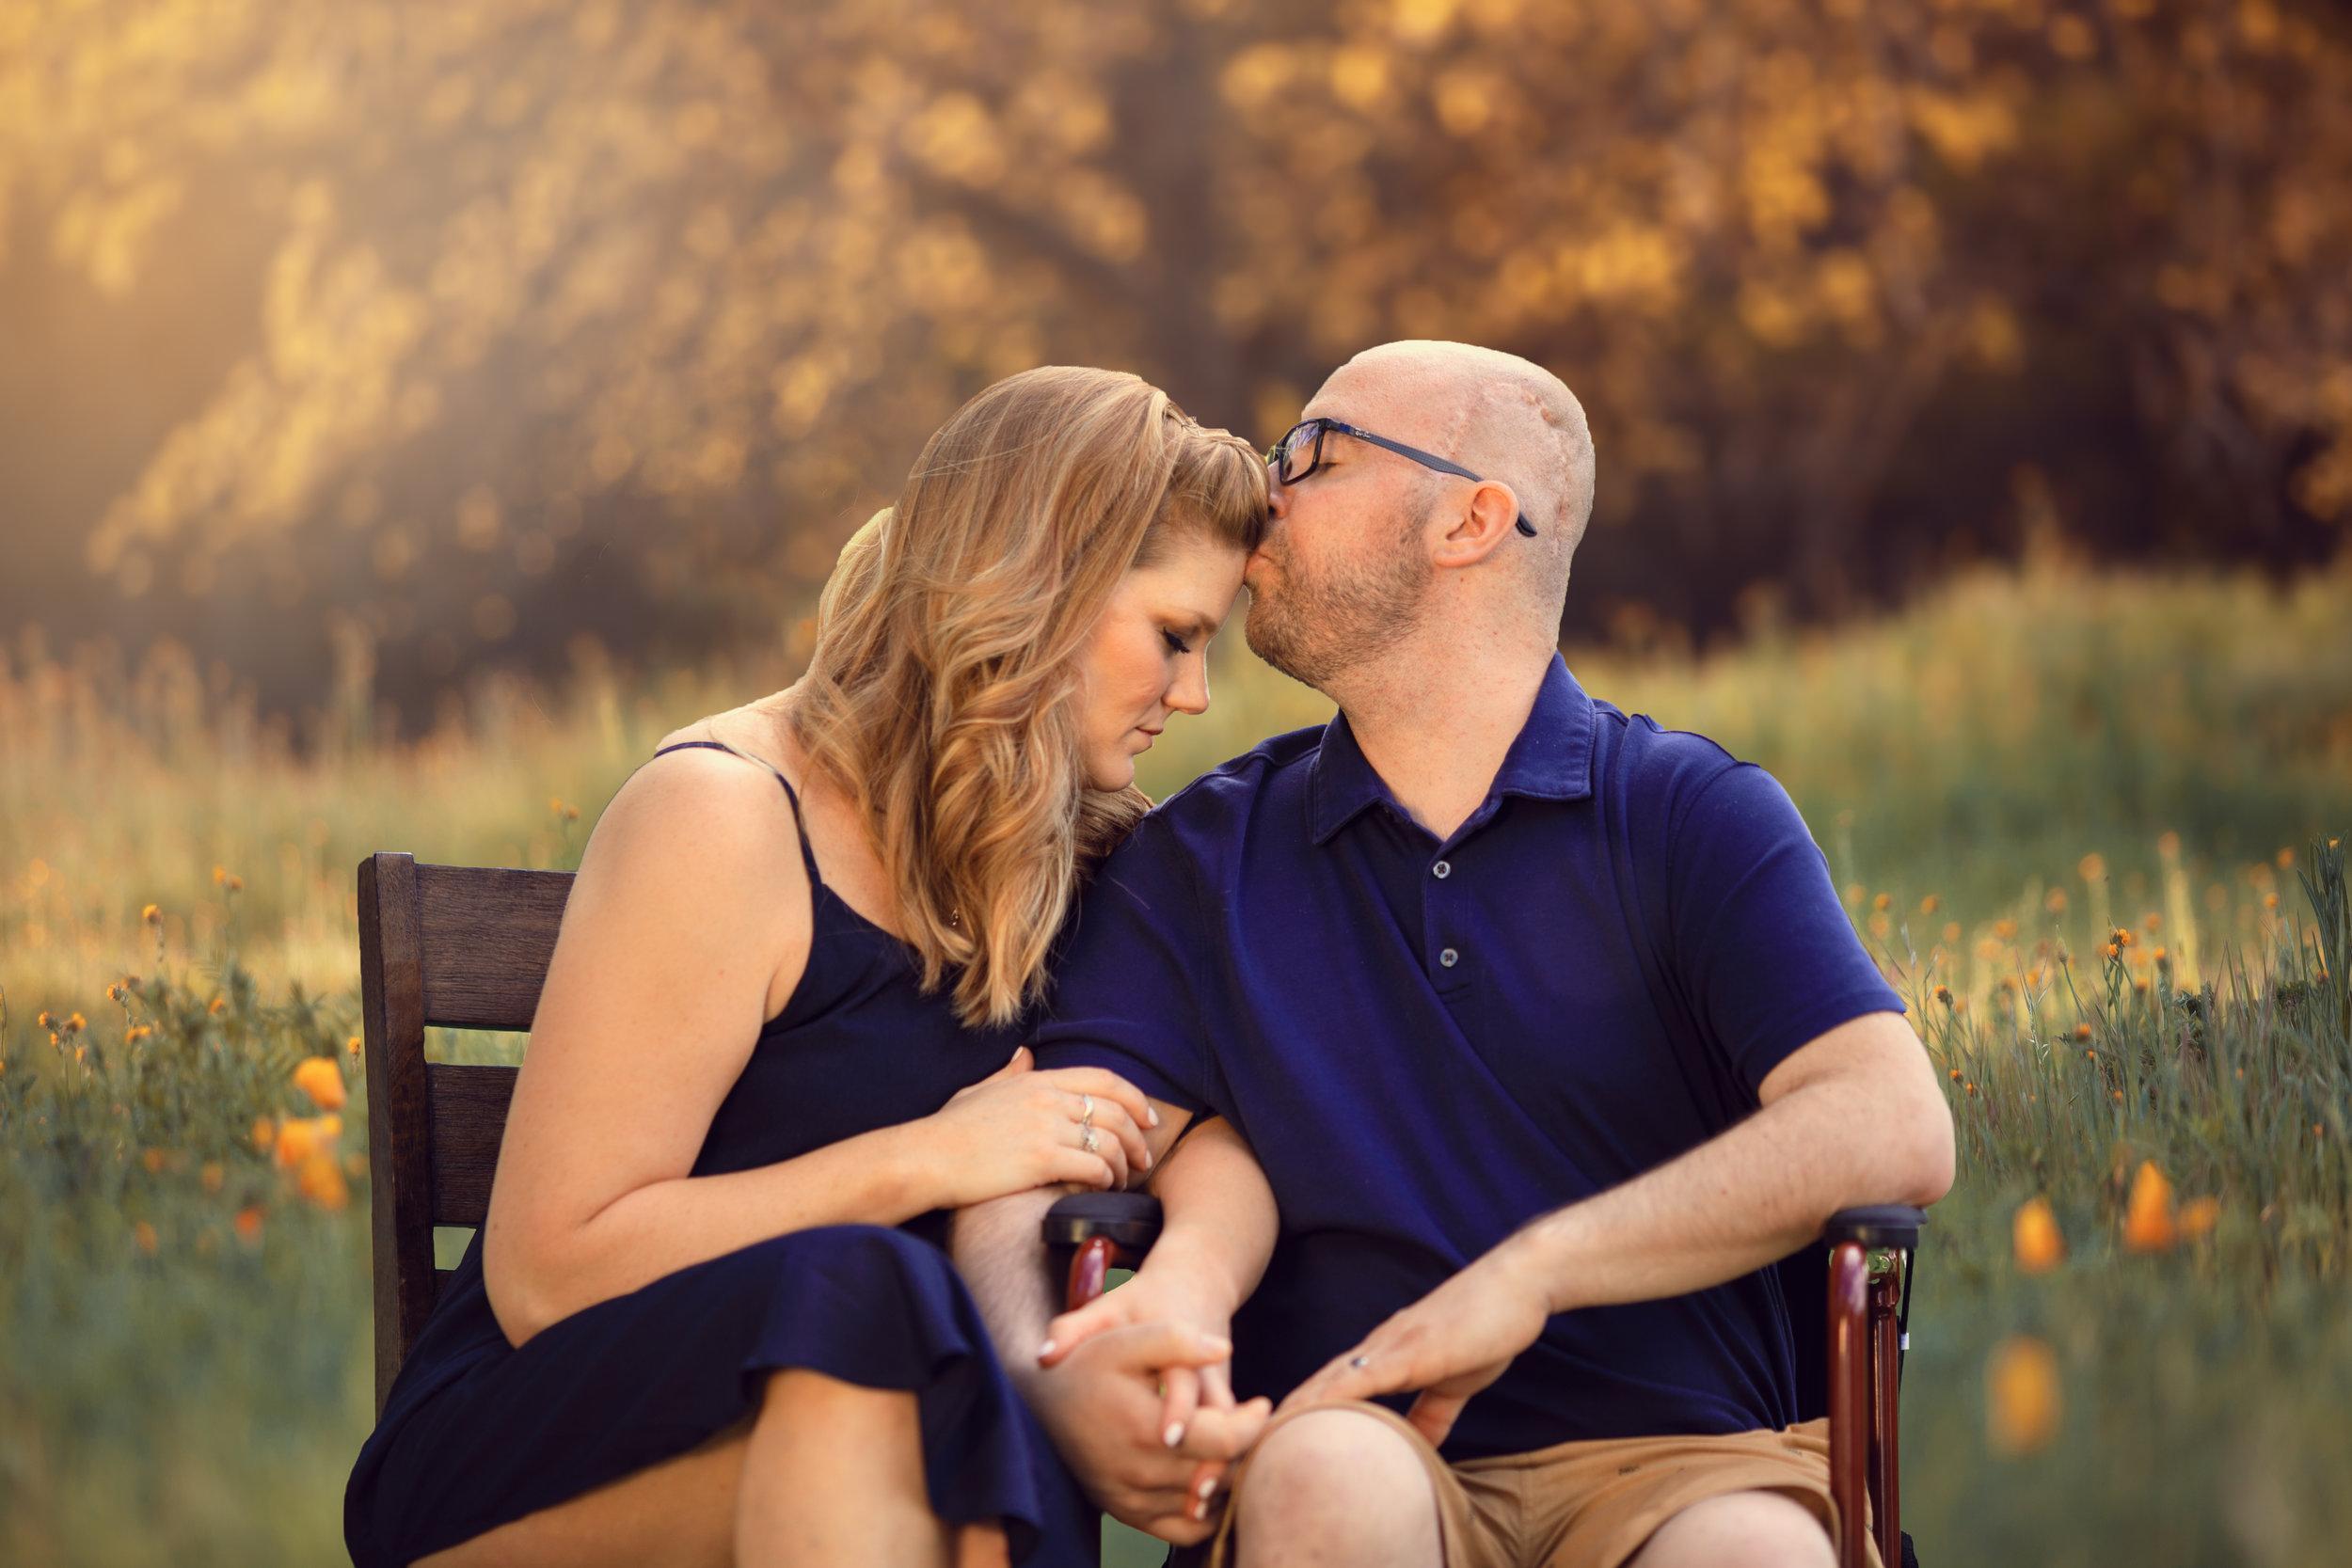 Dan-coghlan-terminally-ill-photographs-brain-cancer35.jpg